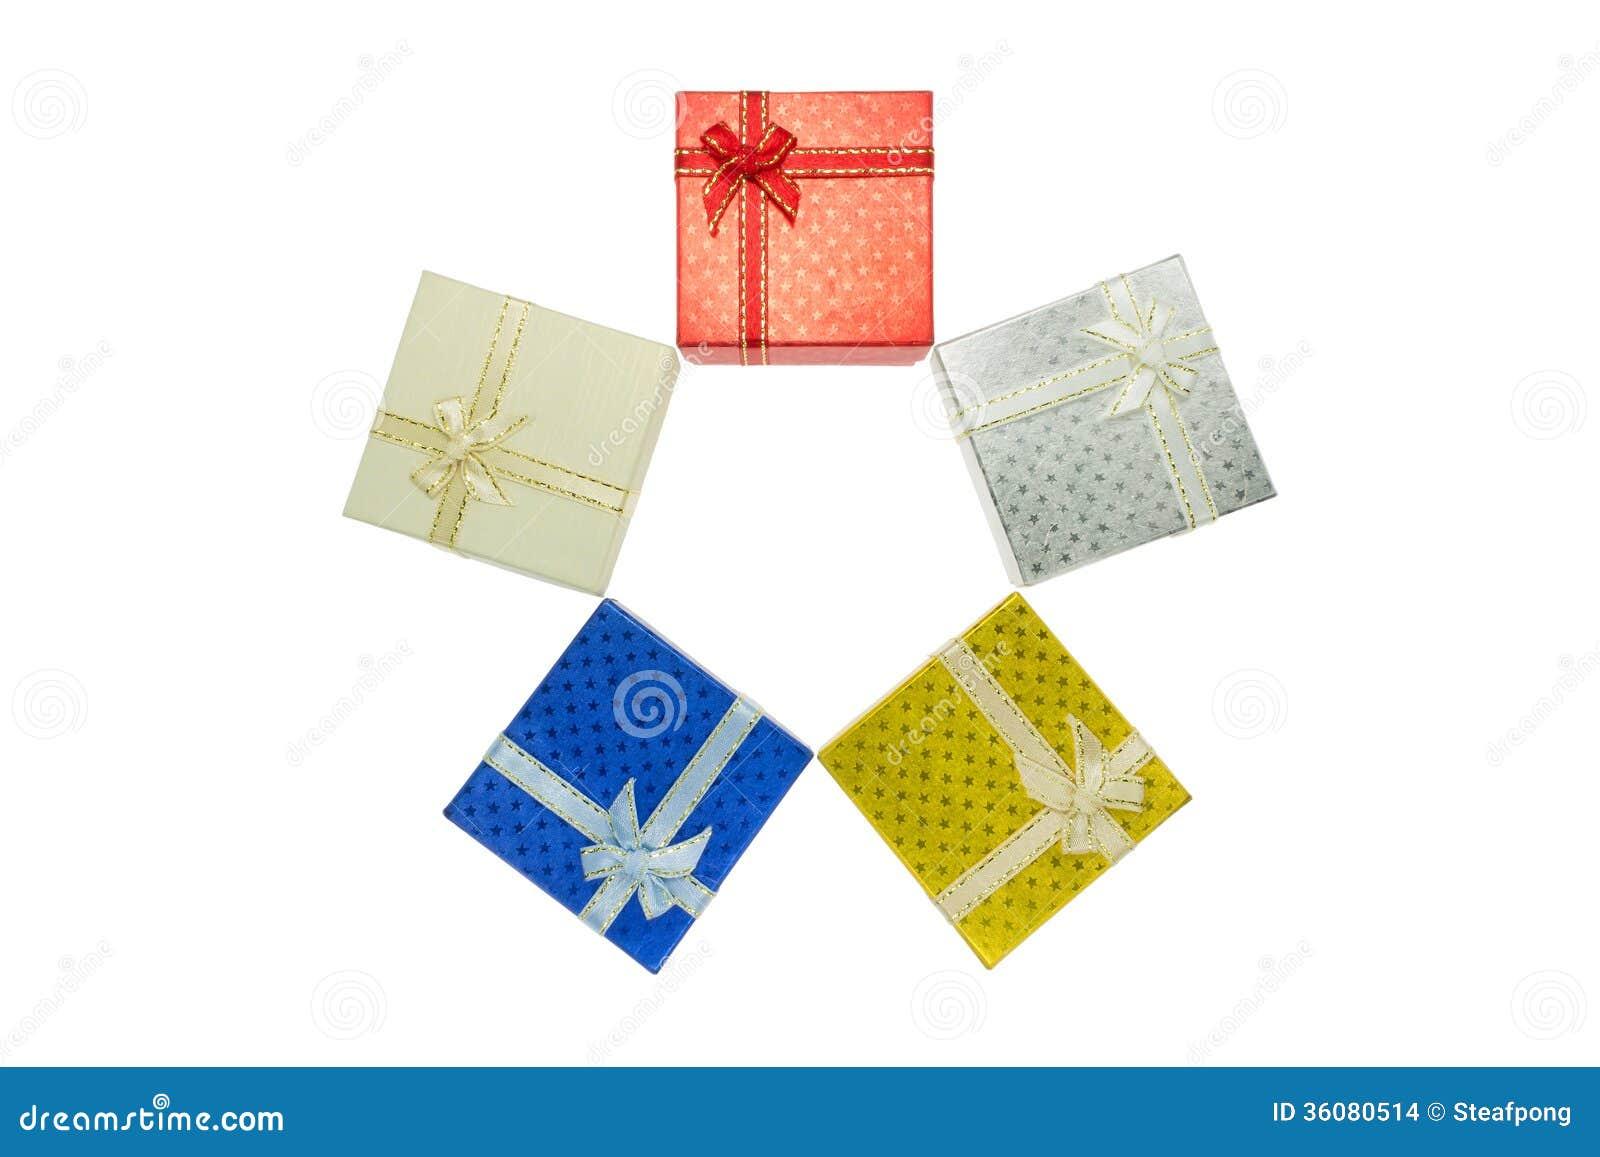 5 Christmas Gift Box Set In Bird\'s Eye View Stock Photo - Image of ...